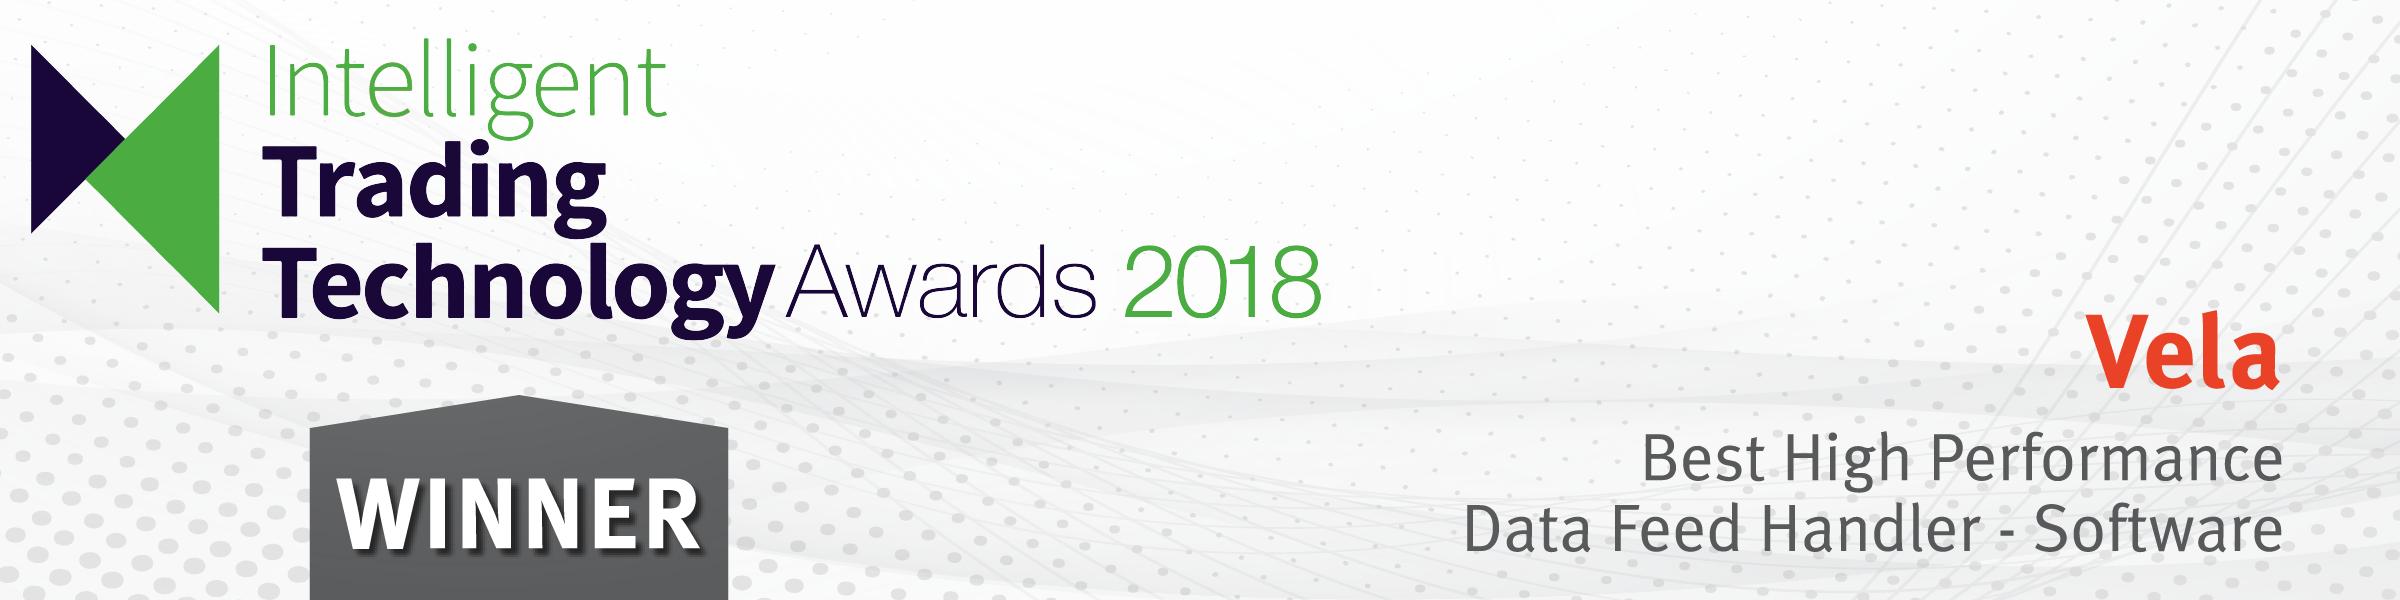 Vela wins Intelligent Trading Technology Award for Best High Performance Data Feed Handler-Software